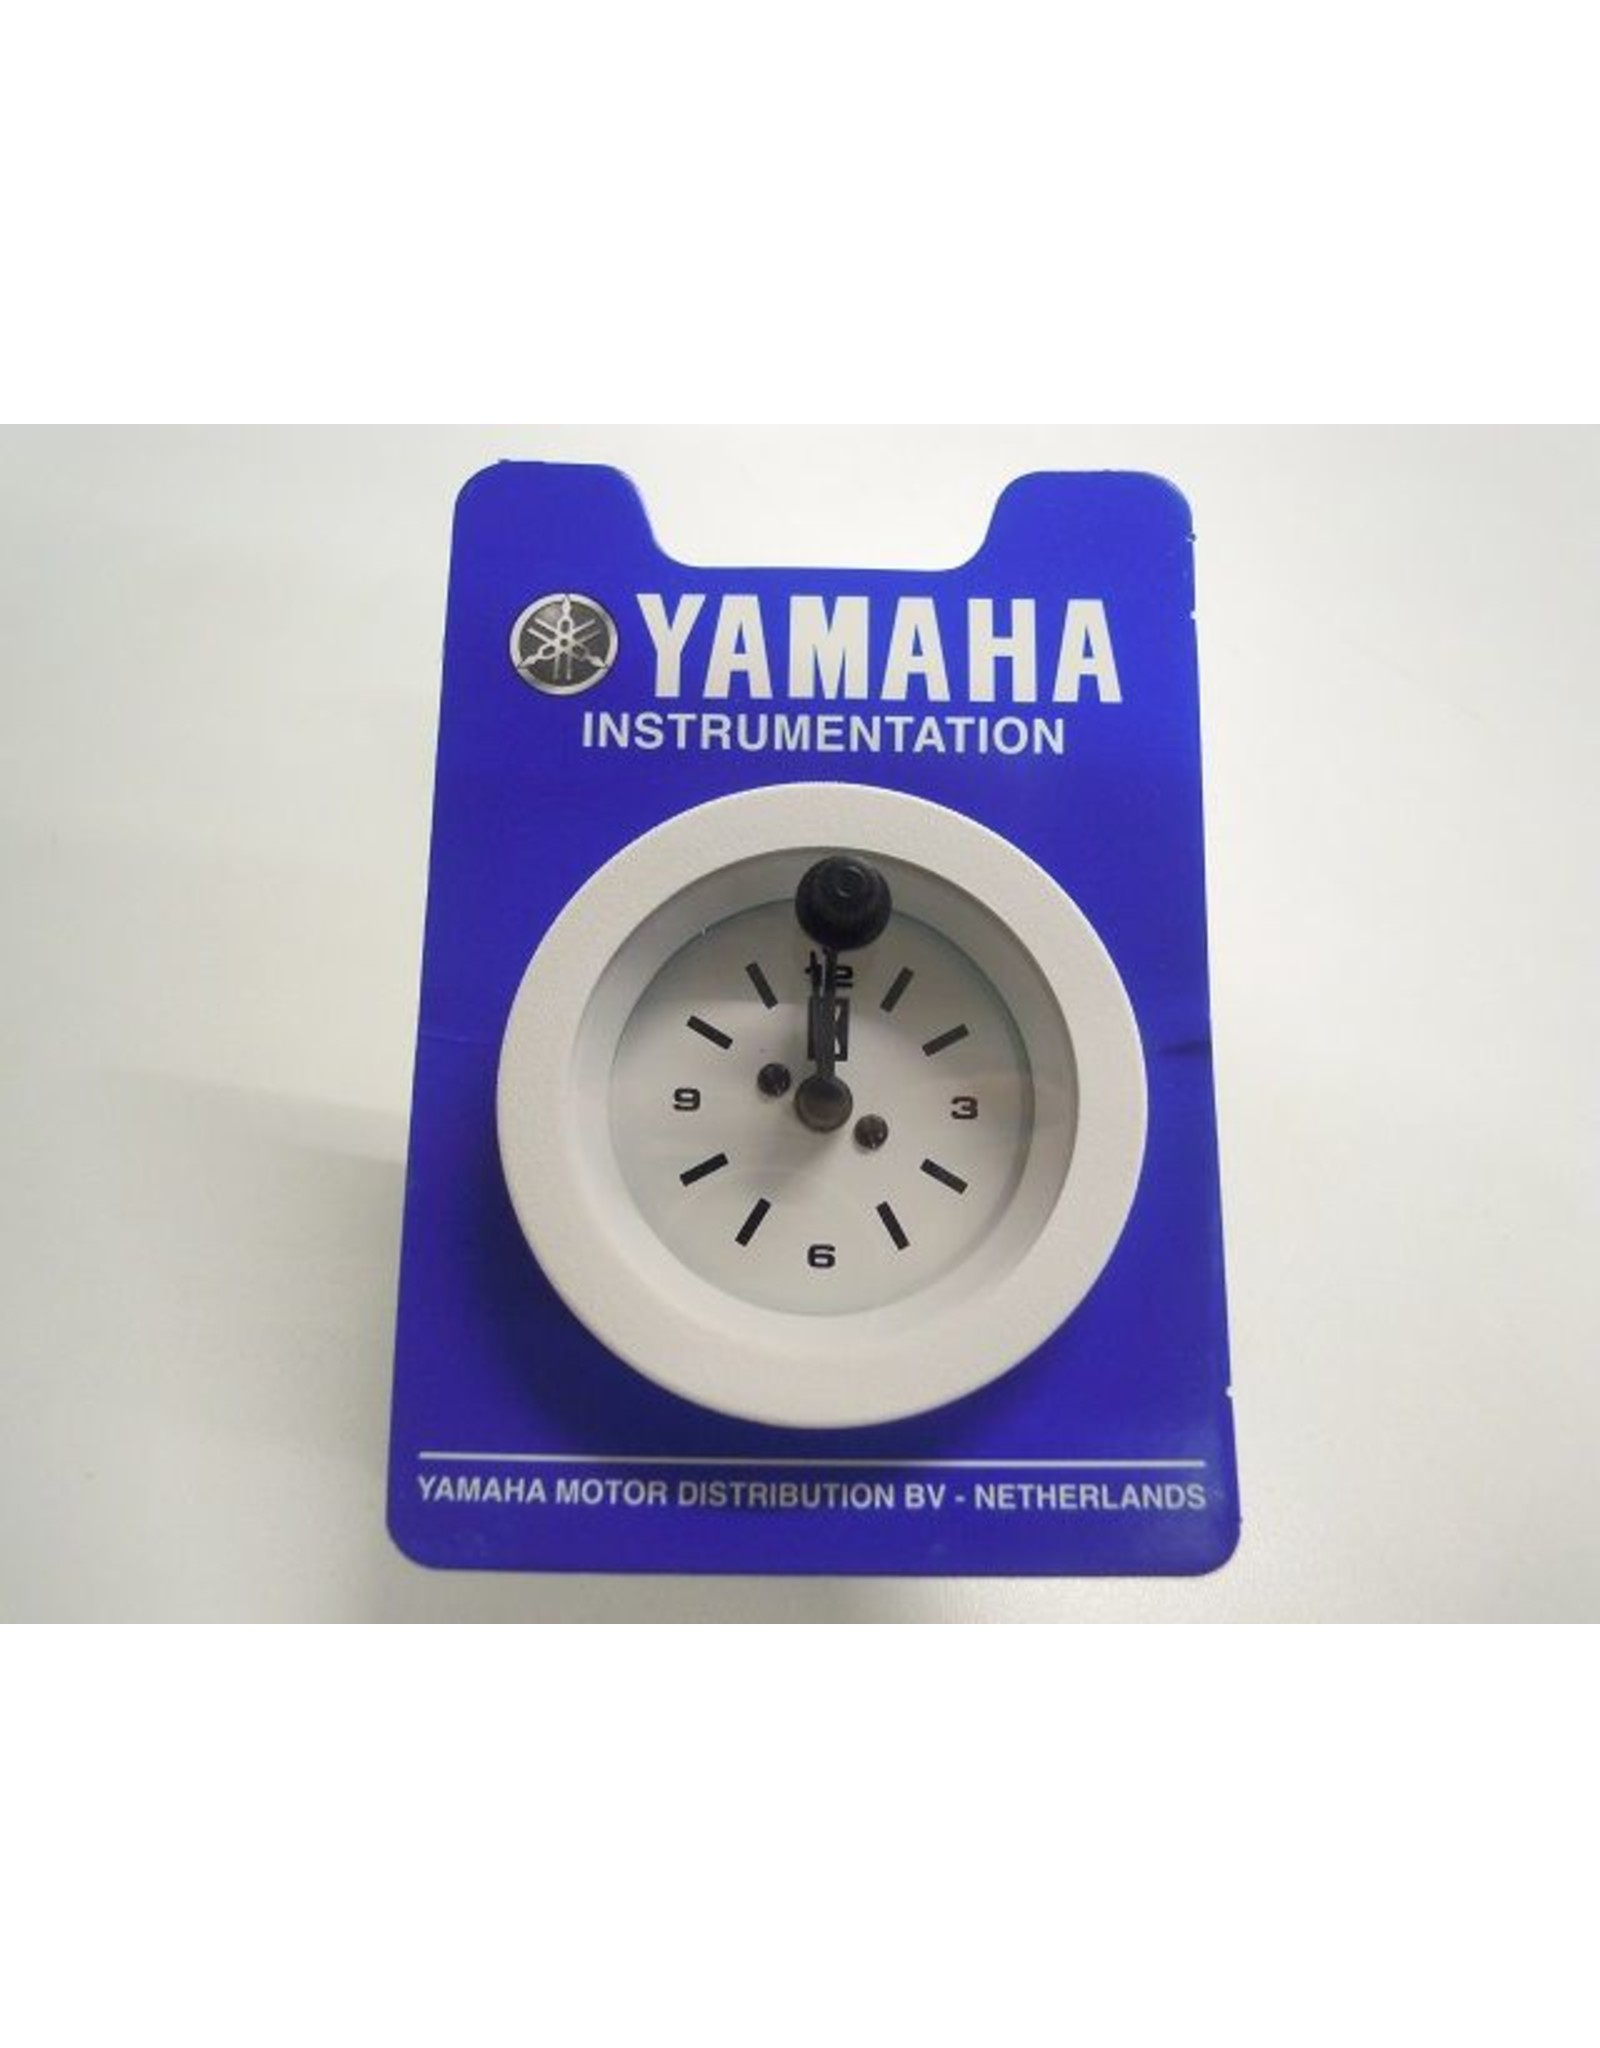 Yamaha Yamaha inbouw klok